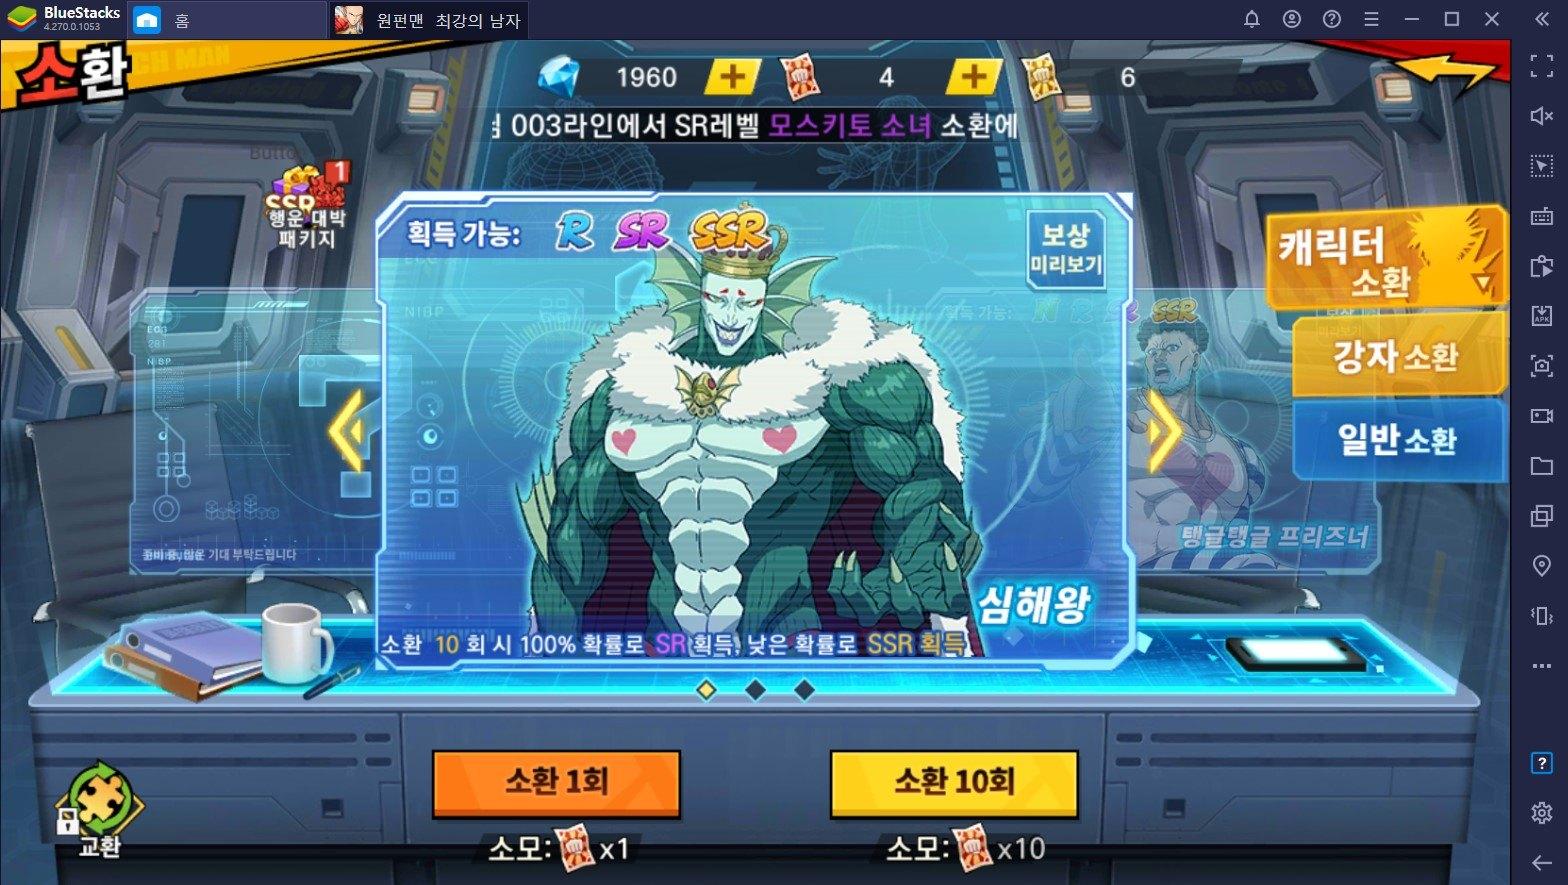 PC에서도 대인기! 원펀맨: 최강의 남자에서 가장 빠르게 SSR 캐릭터를 모을 수 있는 방법은?